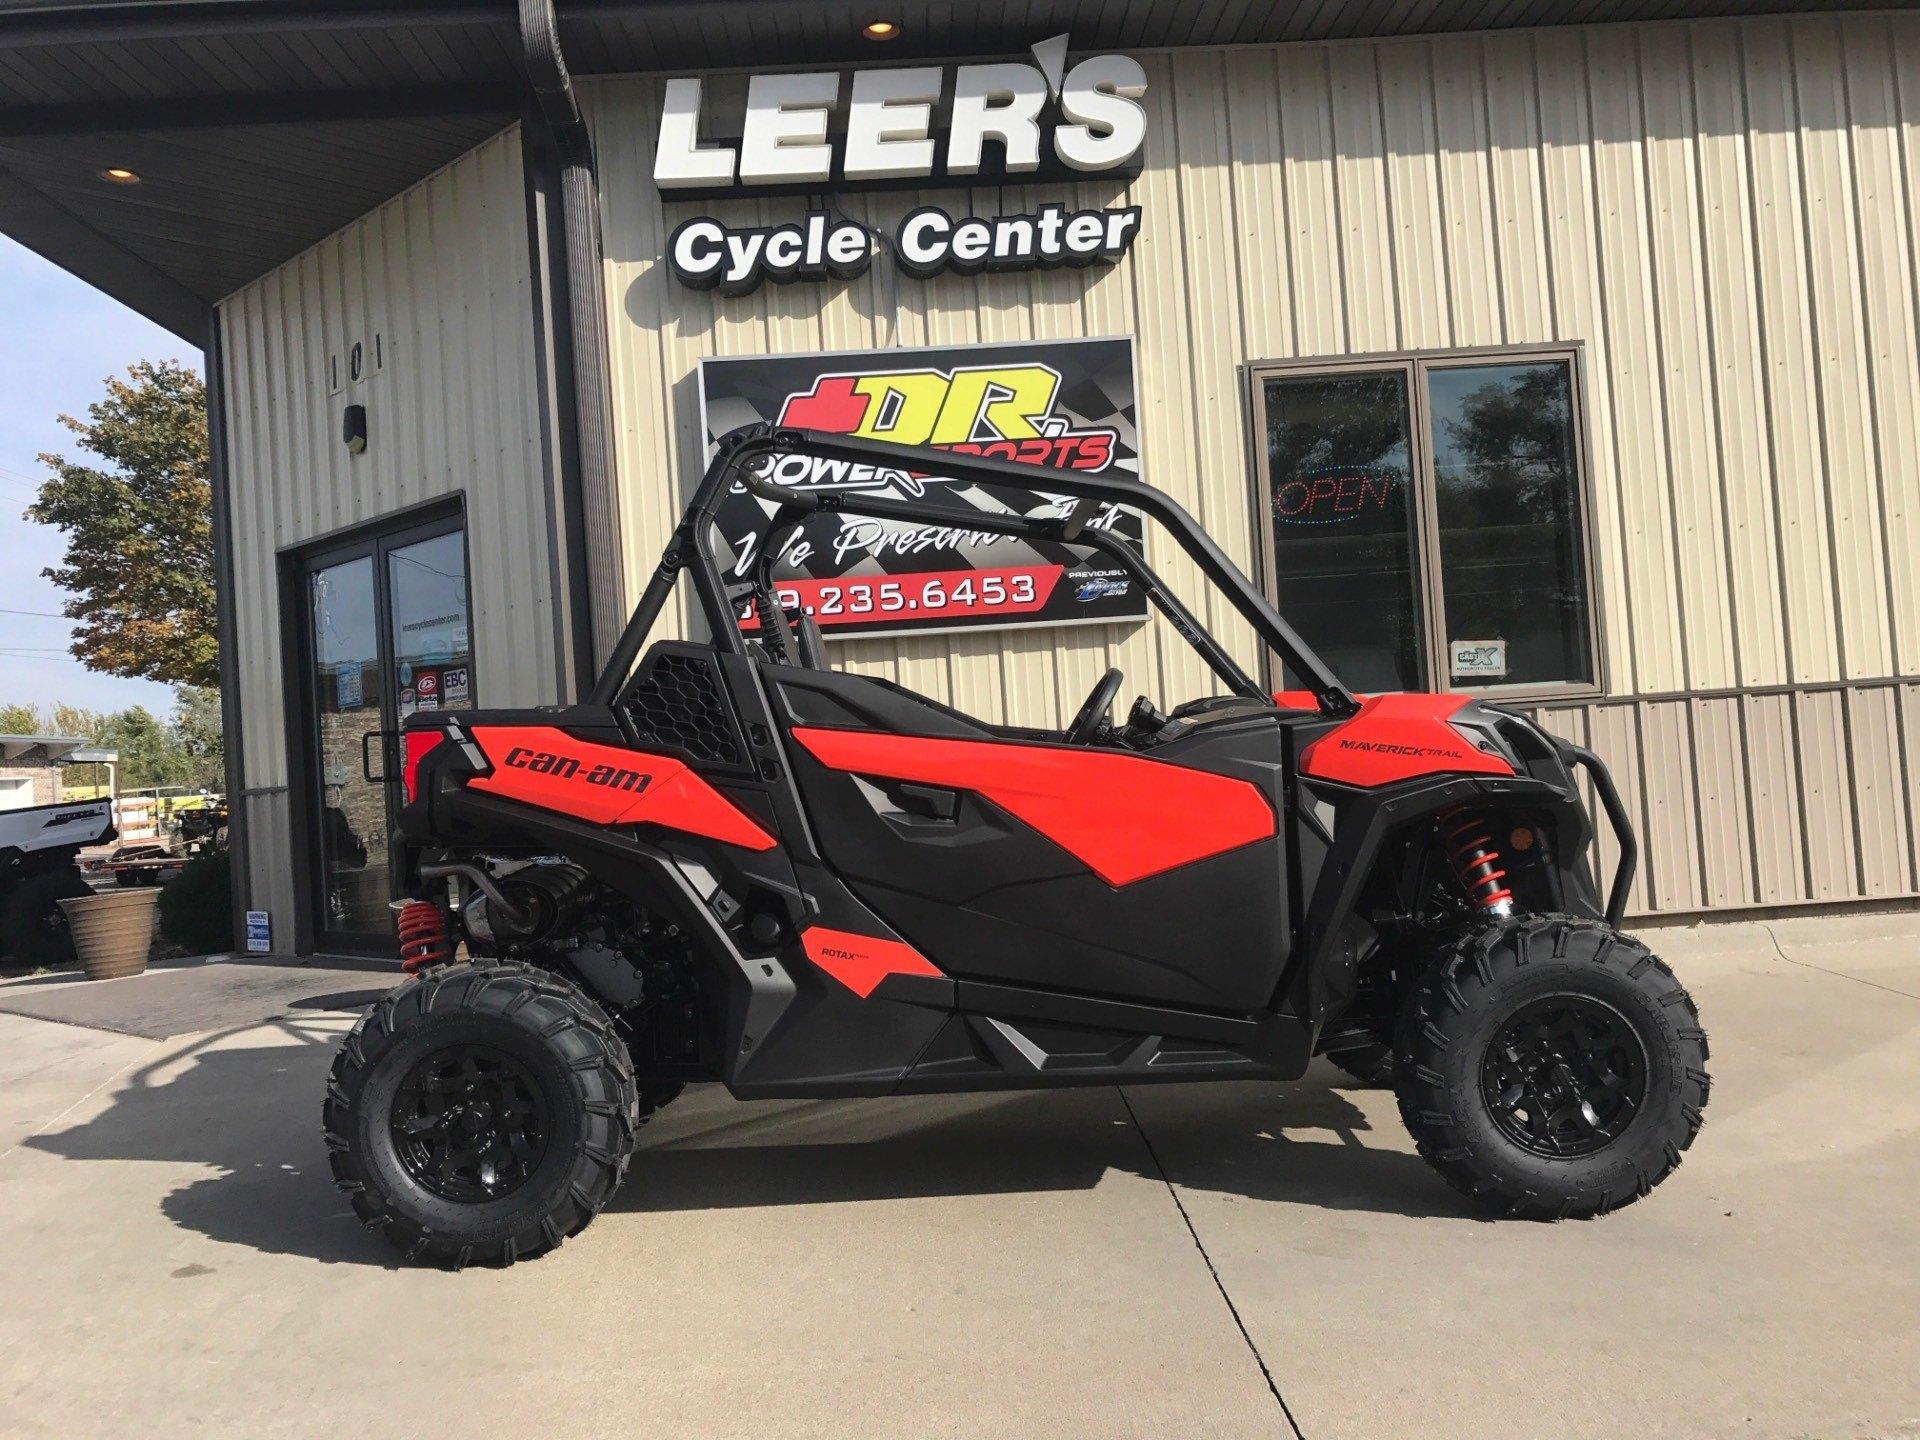 2018 Can Am Maverick Trail 1000 DPS Utility Vehicles Waterloo Iowa